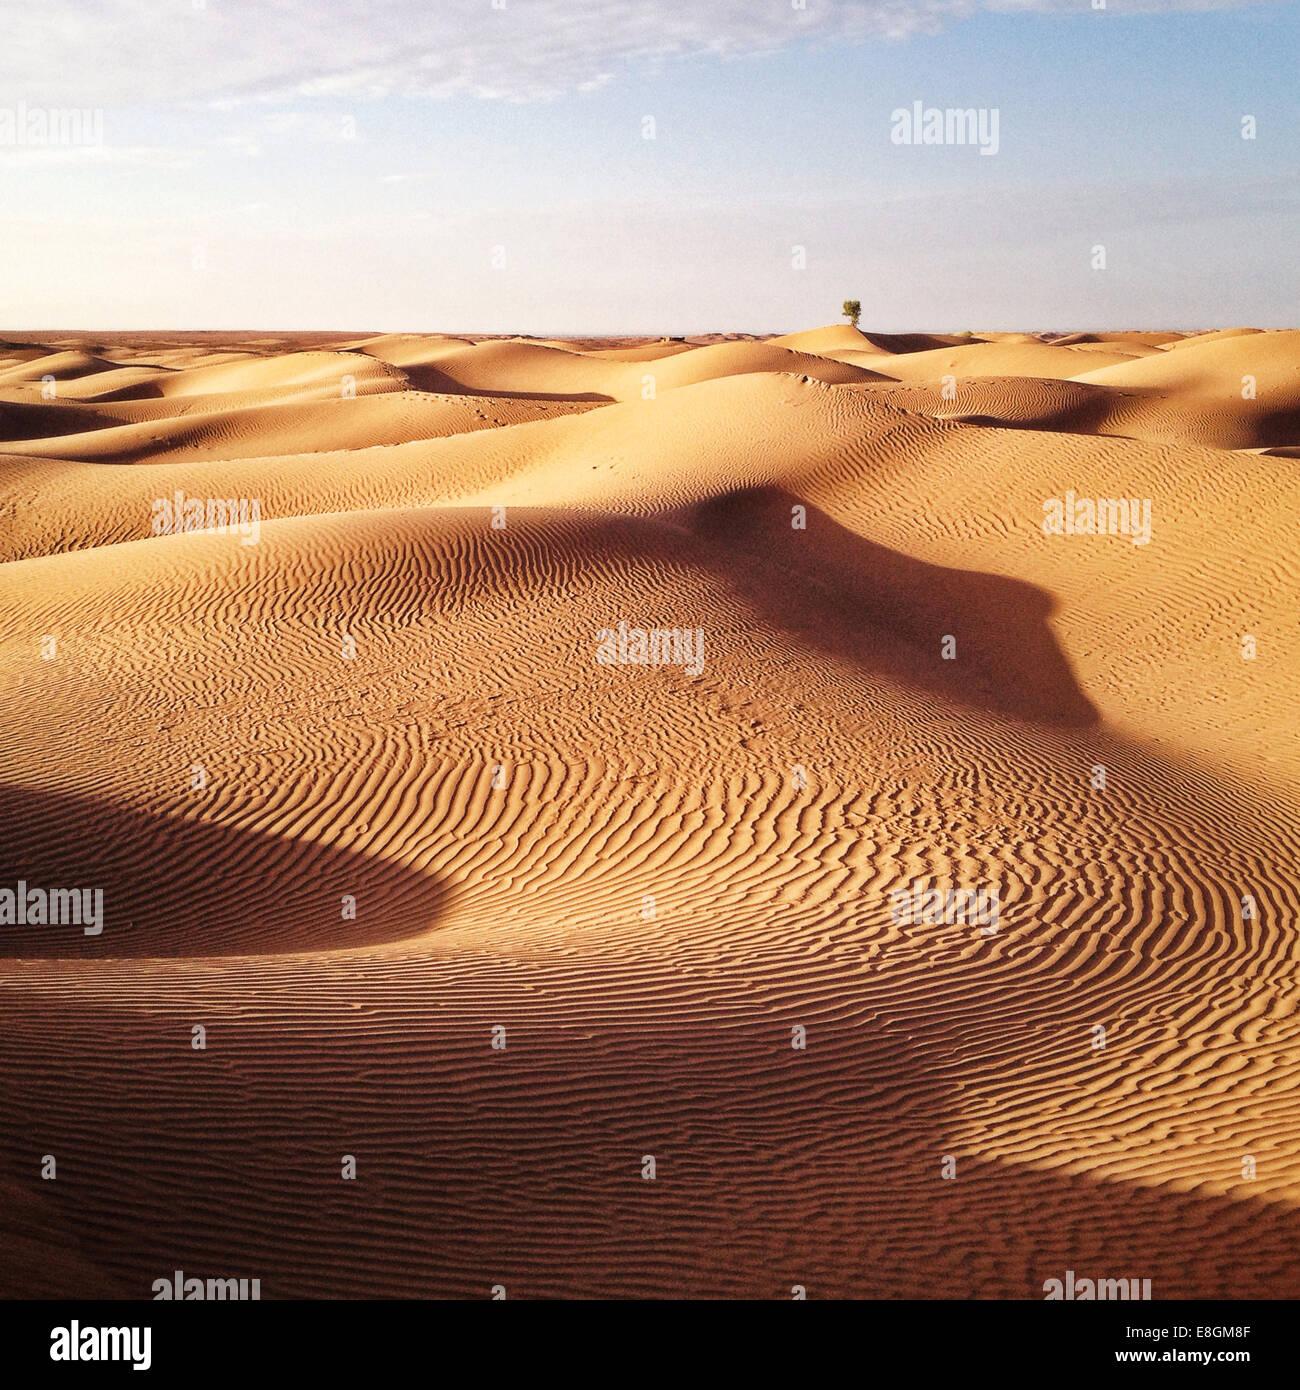 Morocco, Sahara Desert - Stock Image